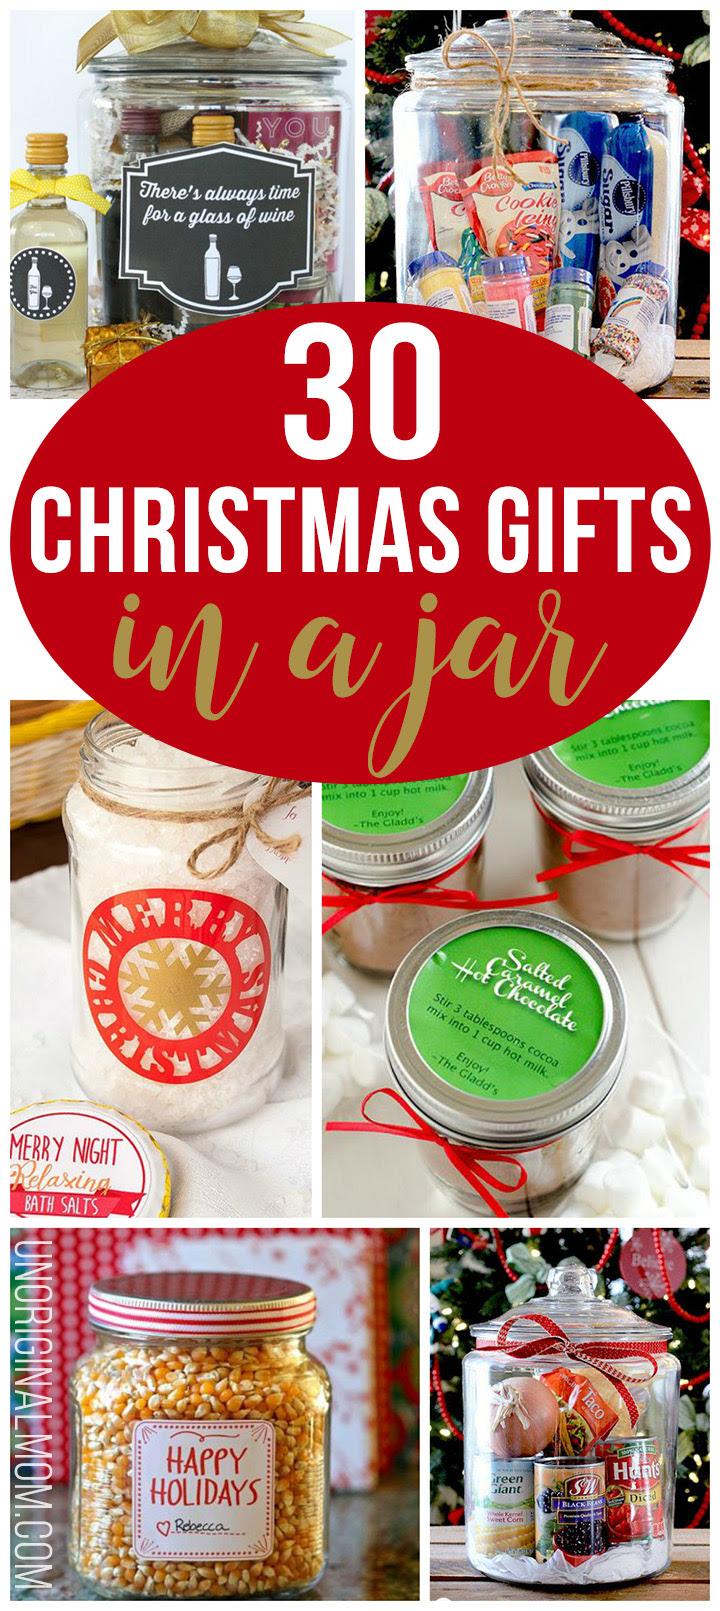 30 Christmas Gifts in a Jar - unOriginal Mom